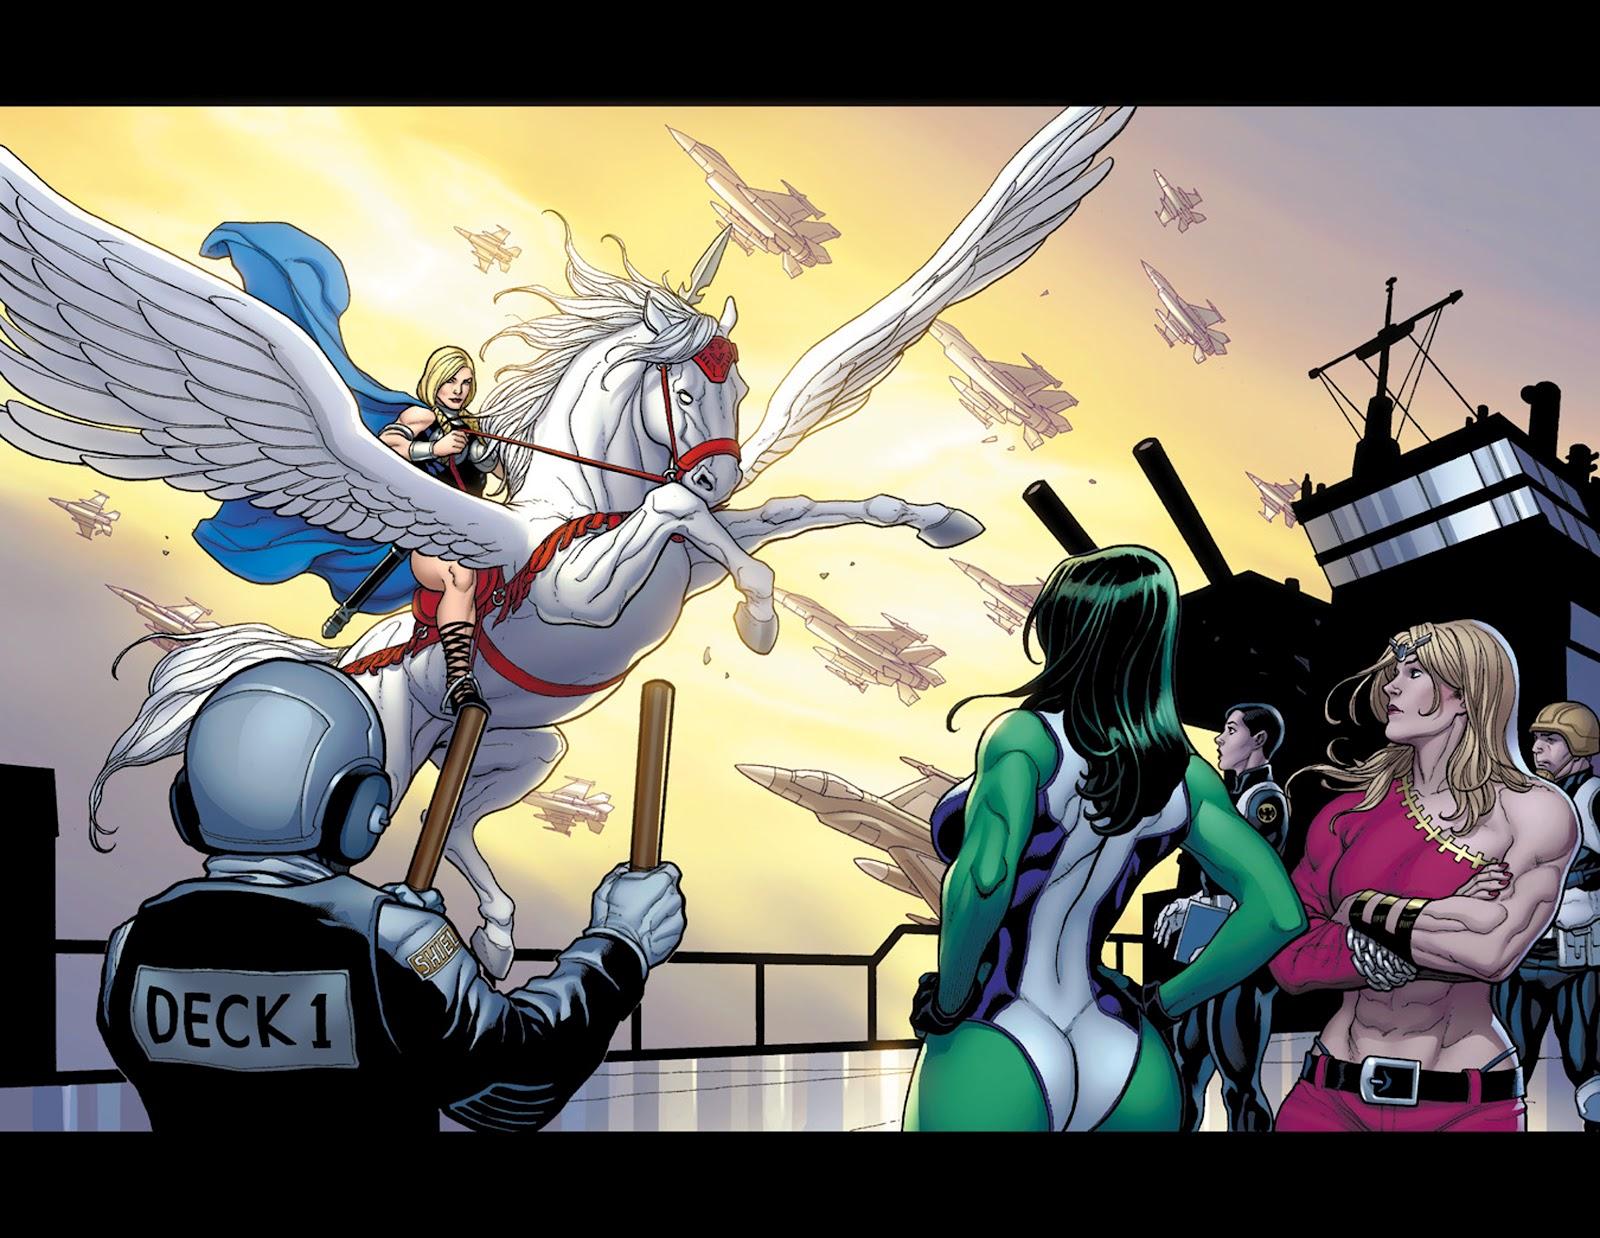 http://2.bp.blogspot.com/-bZCwzhsz0kI/T4vaQUg9FlI/AAAAAAAAE14/DxuH6DksGHU/s1600/Hulk3+frank+cho+she+hulk+big+fat+phat+ass+booty+butt+pegasus+marvel+comics+valkyrie+valkerie+shehulk+flying+horse+unicorn+female+superhero+sexy+wallpaper.jpg